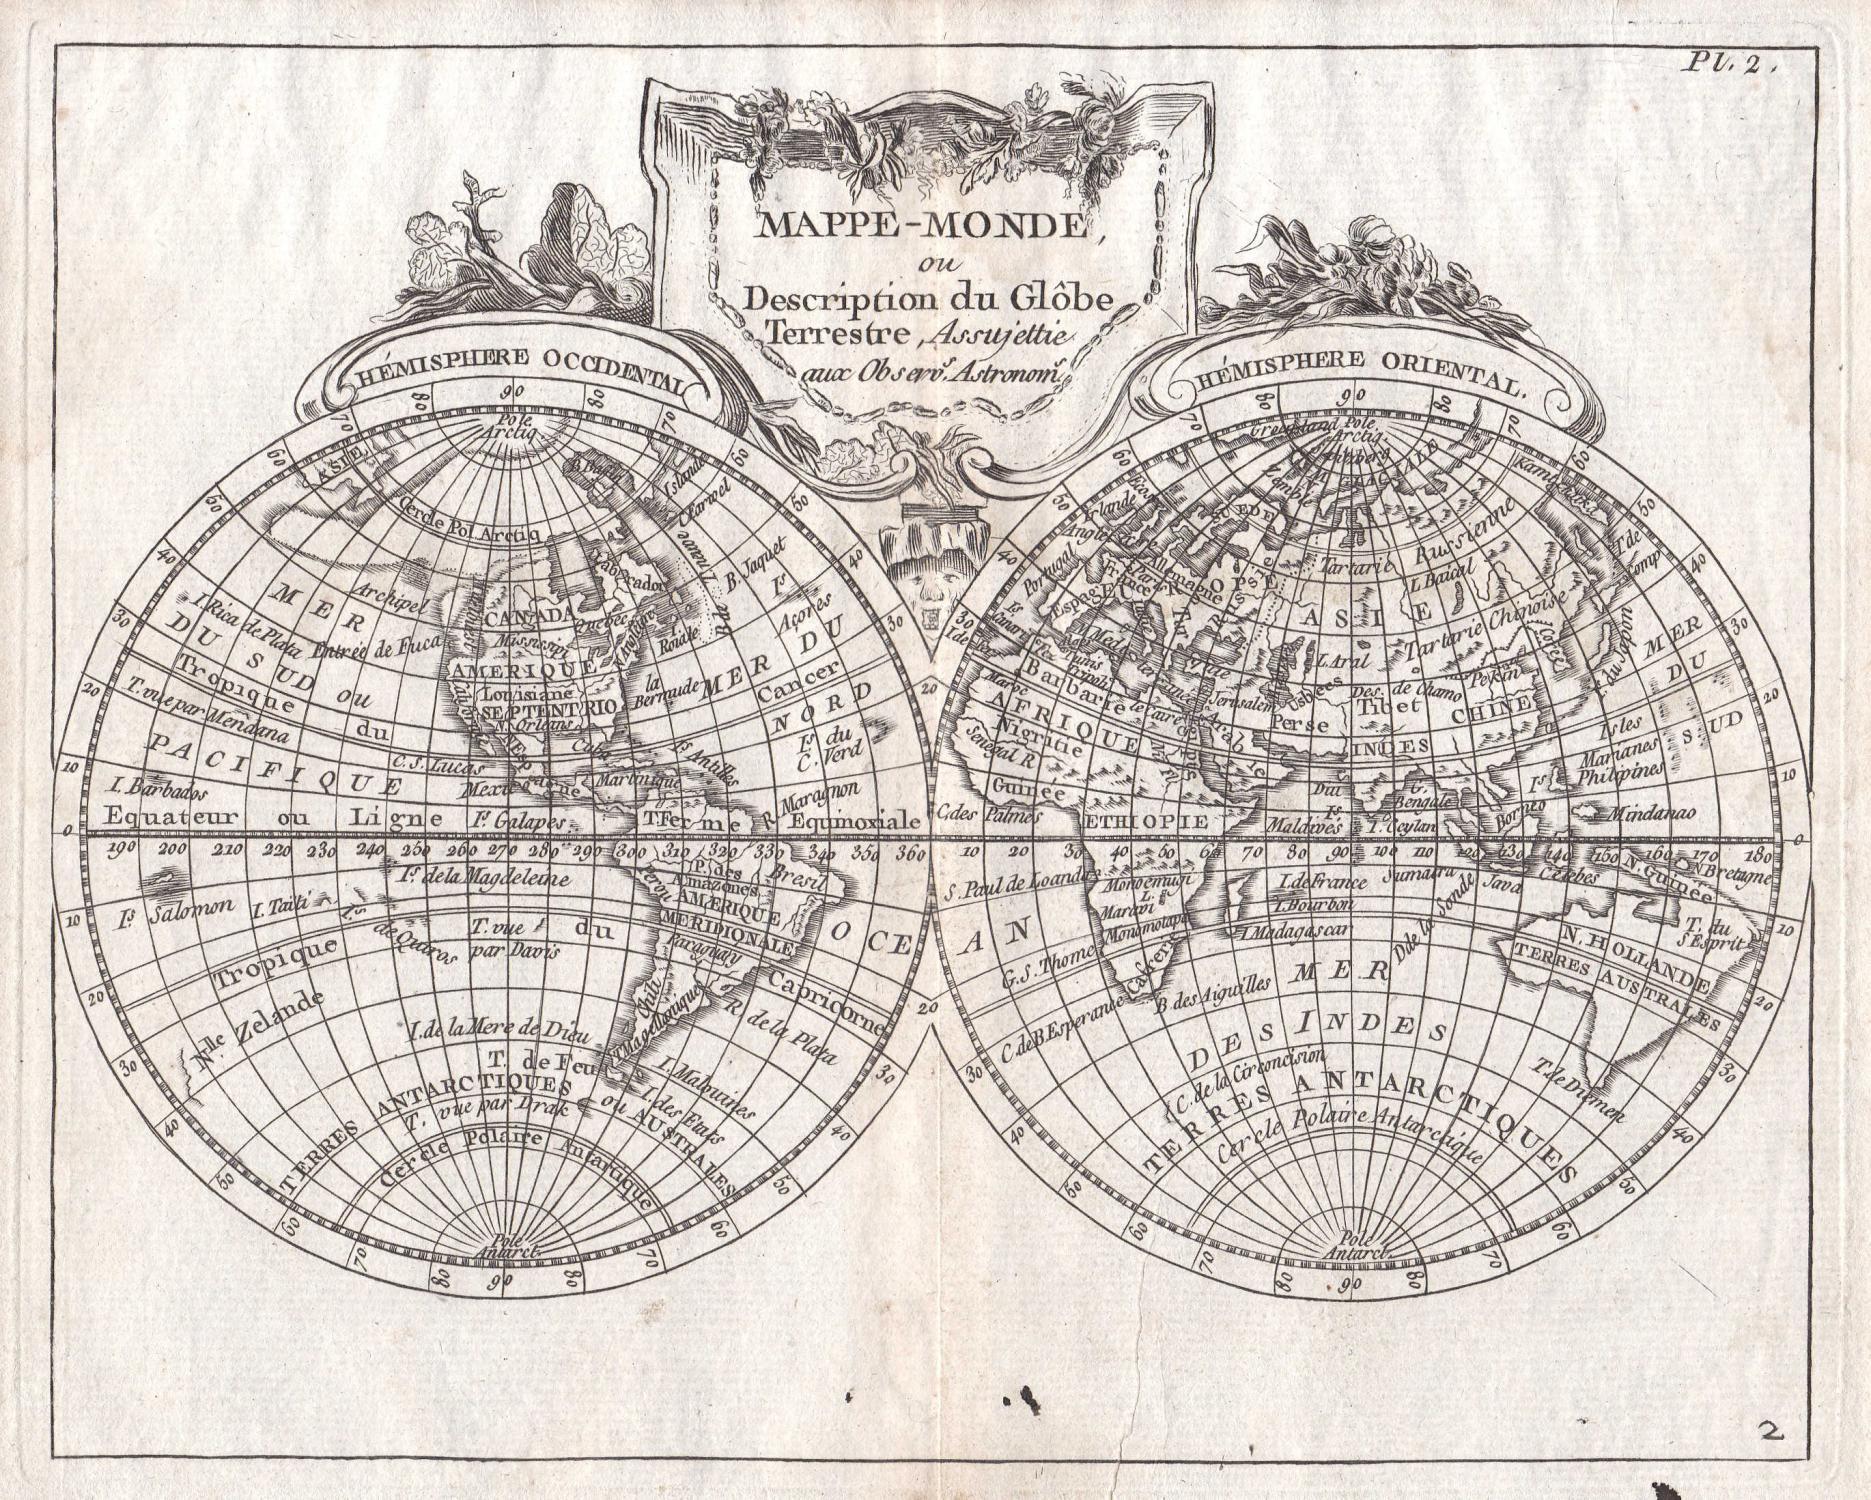 Mappe Monde Ou Description Du Globe Weltkarte Welt Karte World